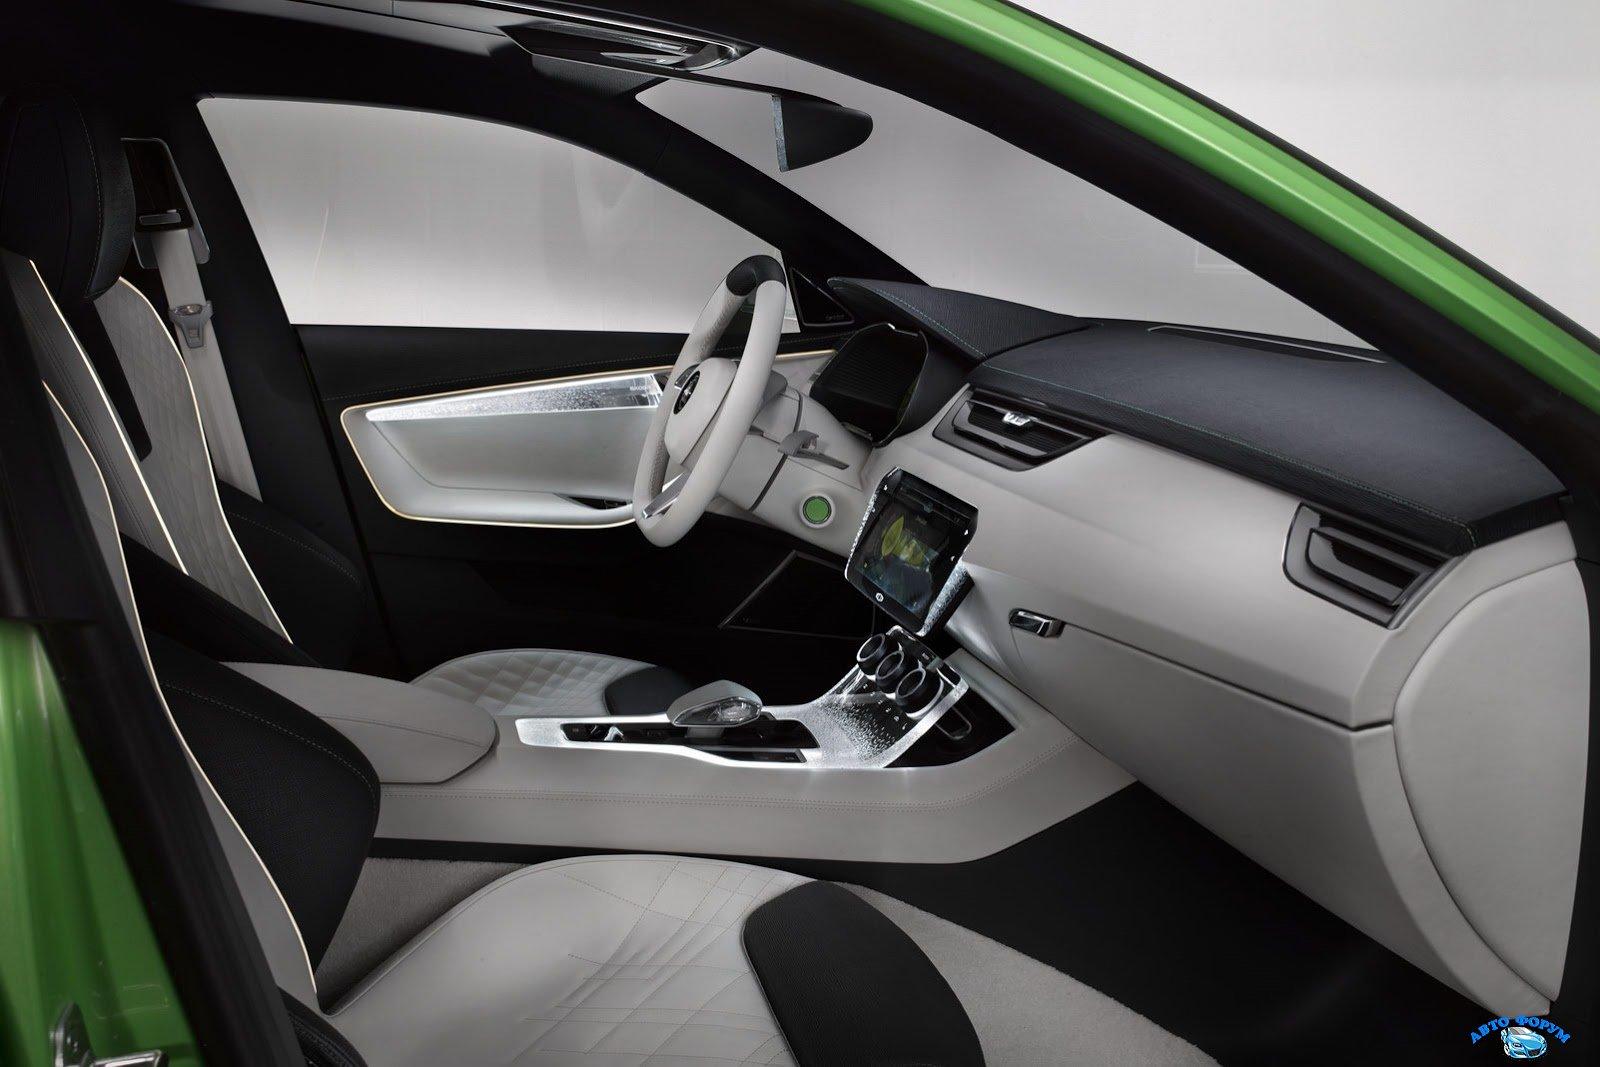 Skoda-VisionC-interior.jpg